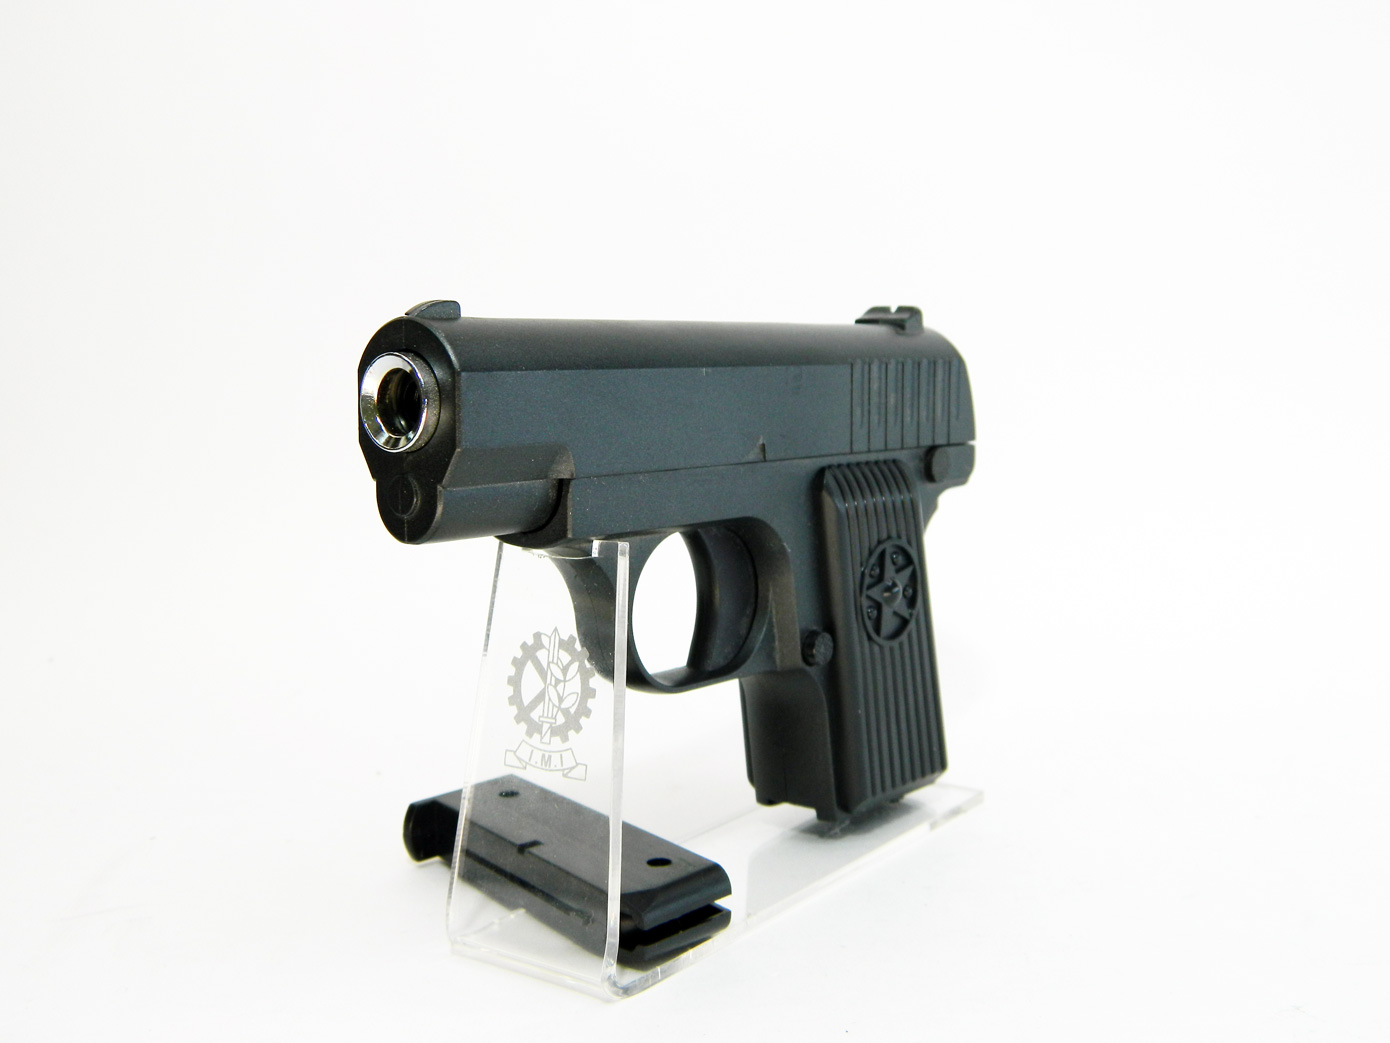 Пистолет ТТ мини изображение 4